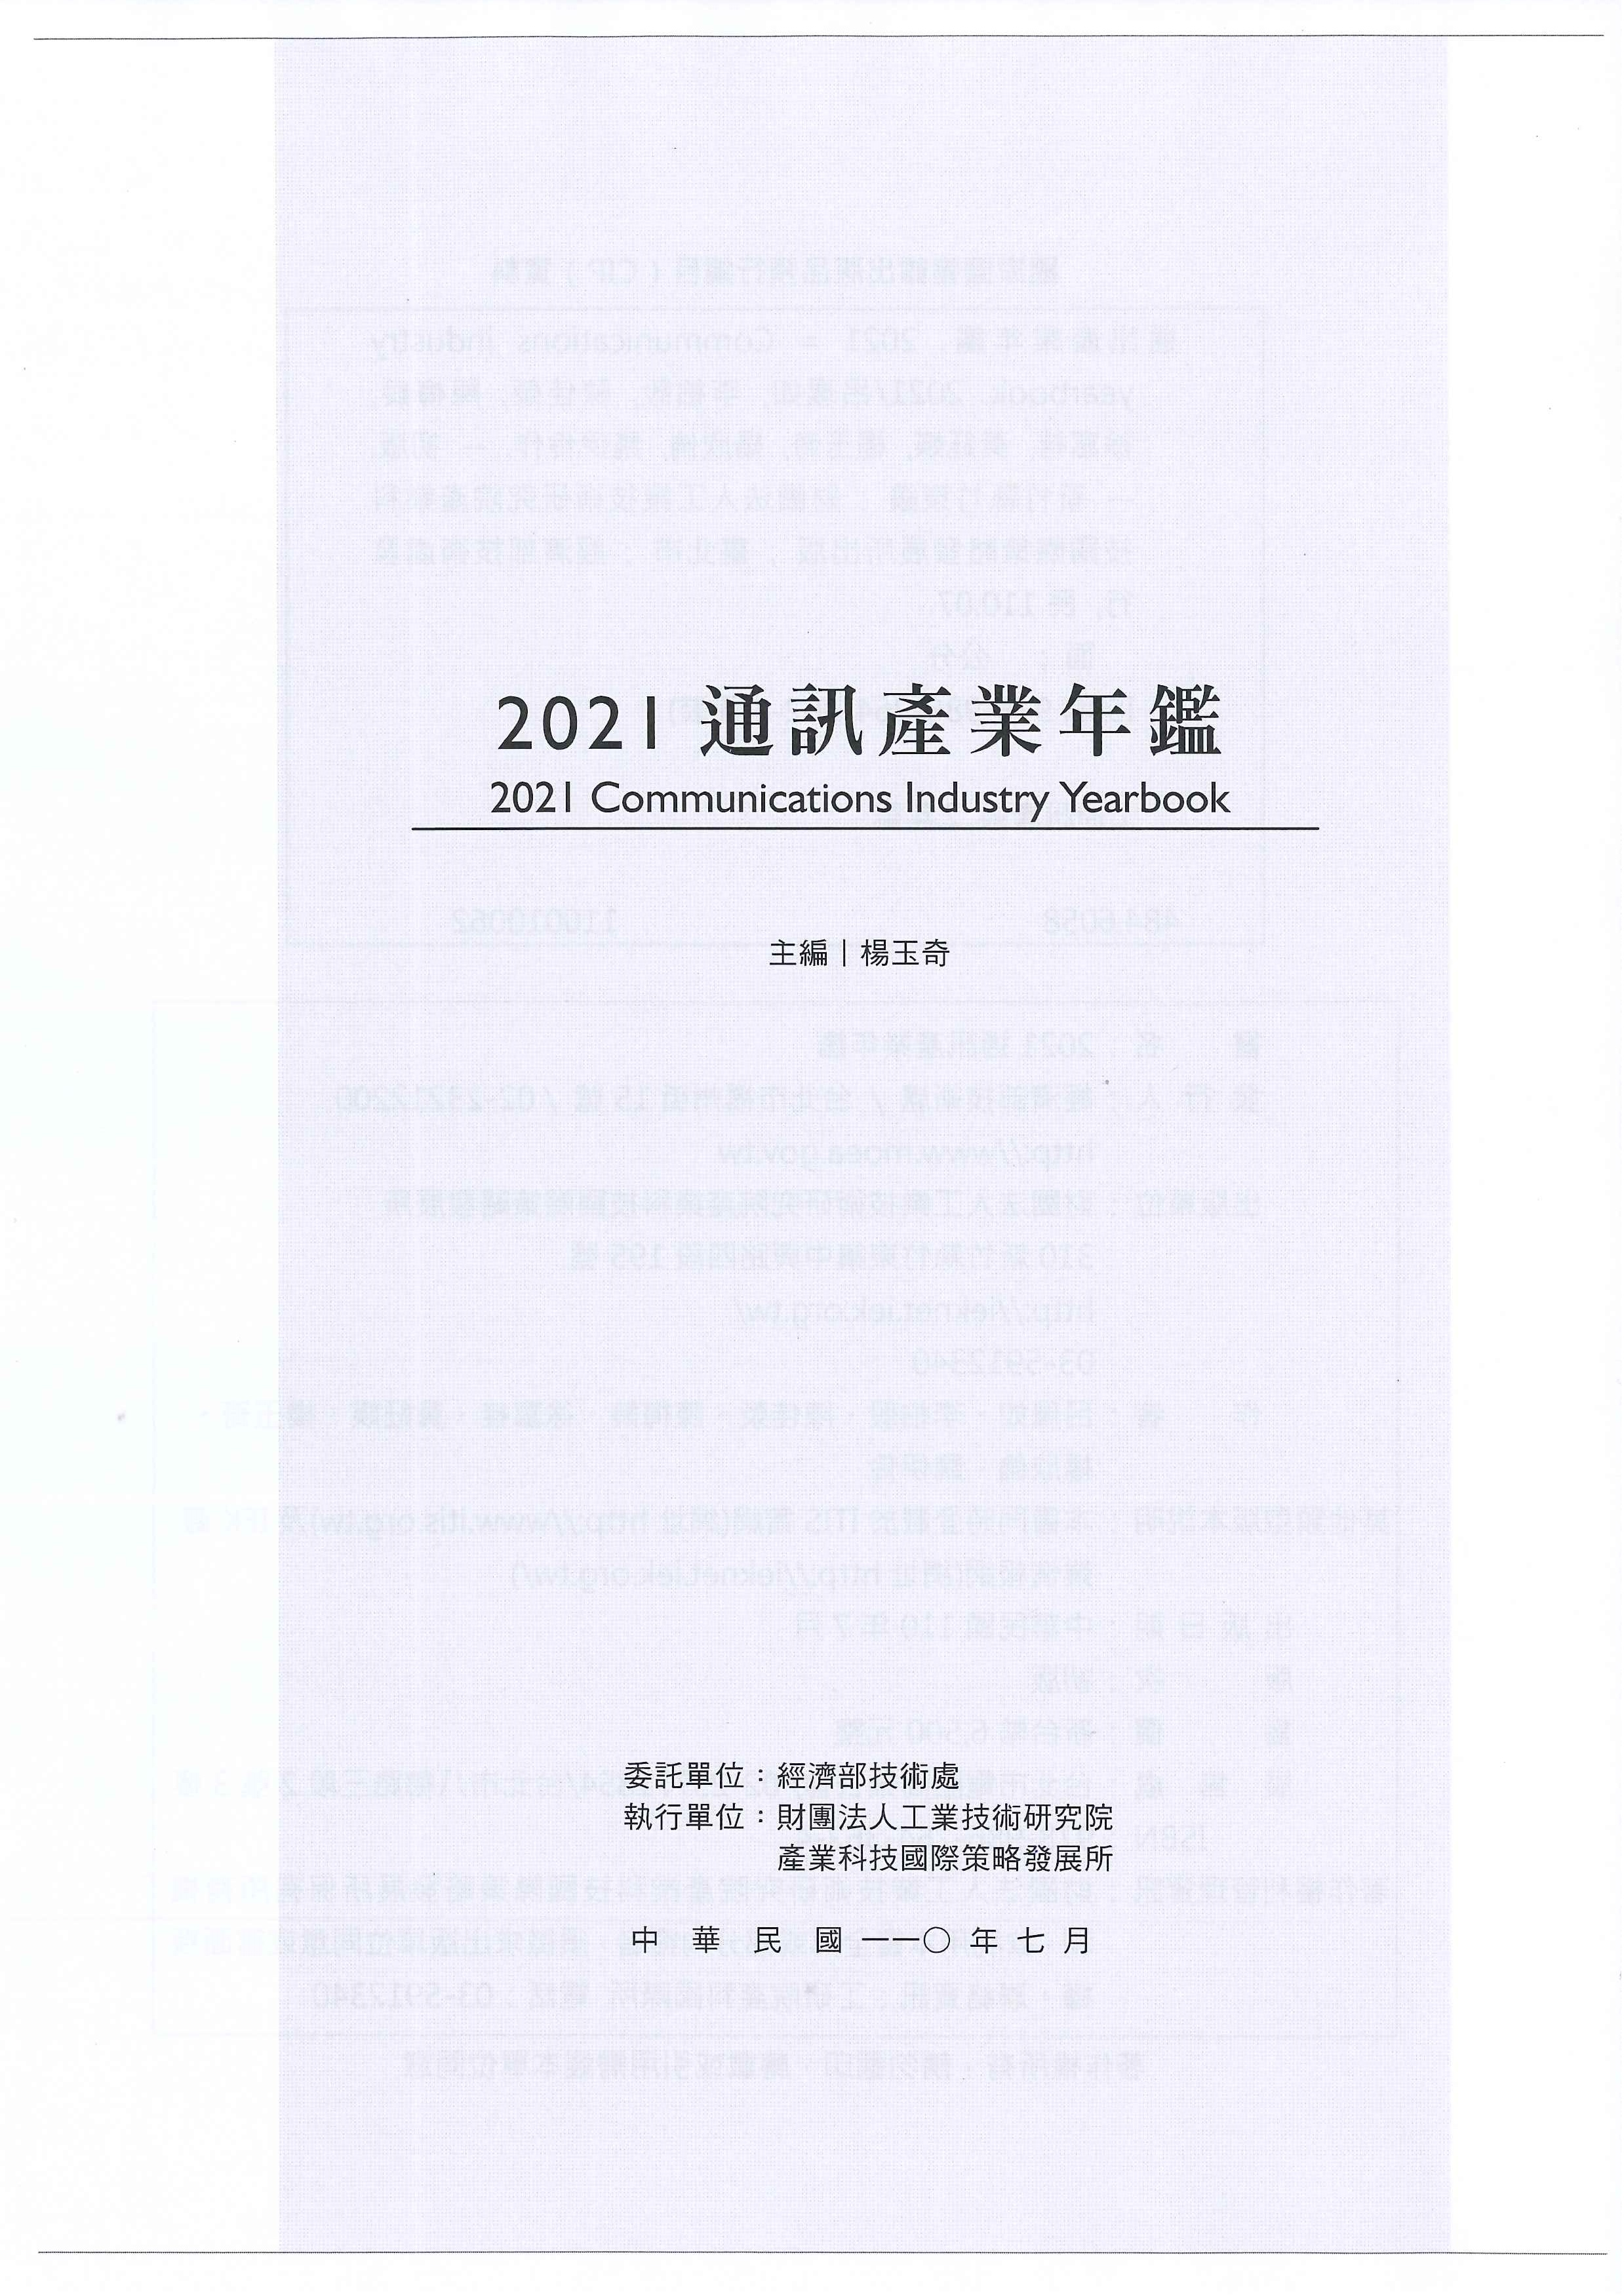 通訊產業年鑑=Communications industry yearbook